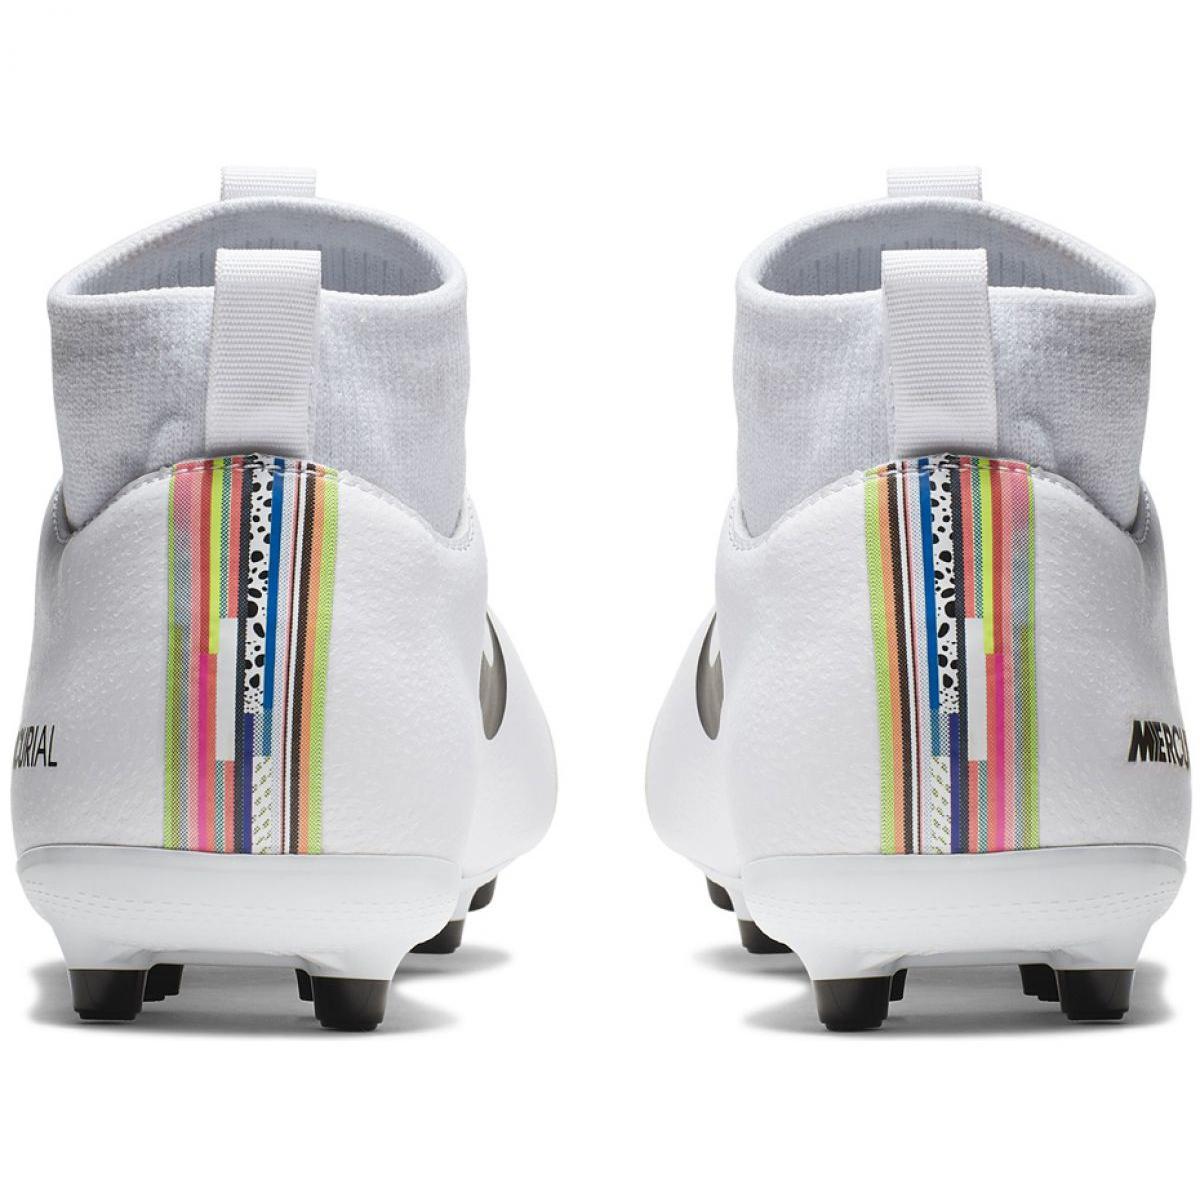 172a9c32203 Fodboldsko Nike Mercurial Superfly 6 Academy Mg Jr AJ3111-109 billede 4